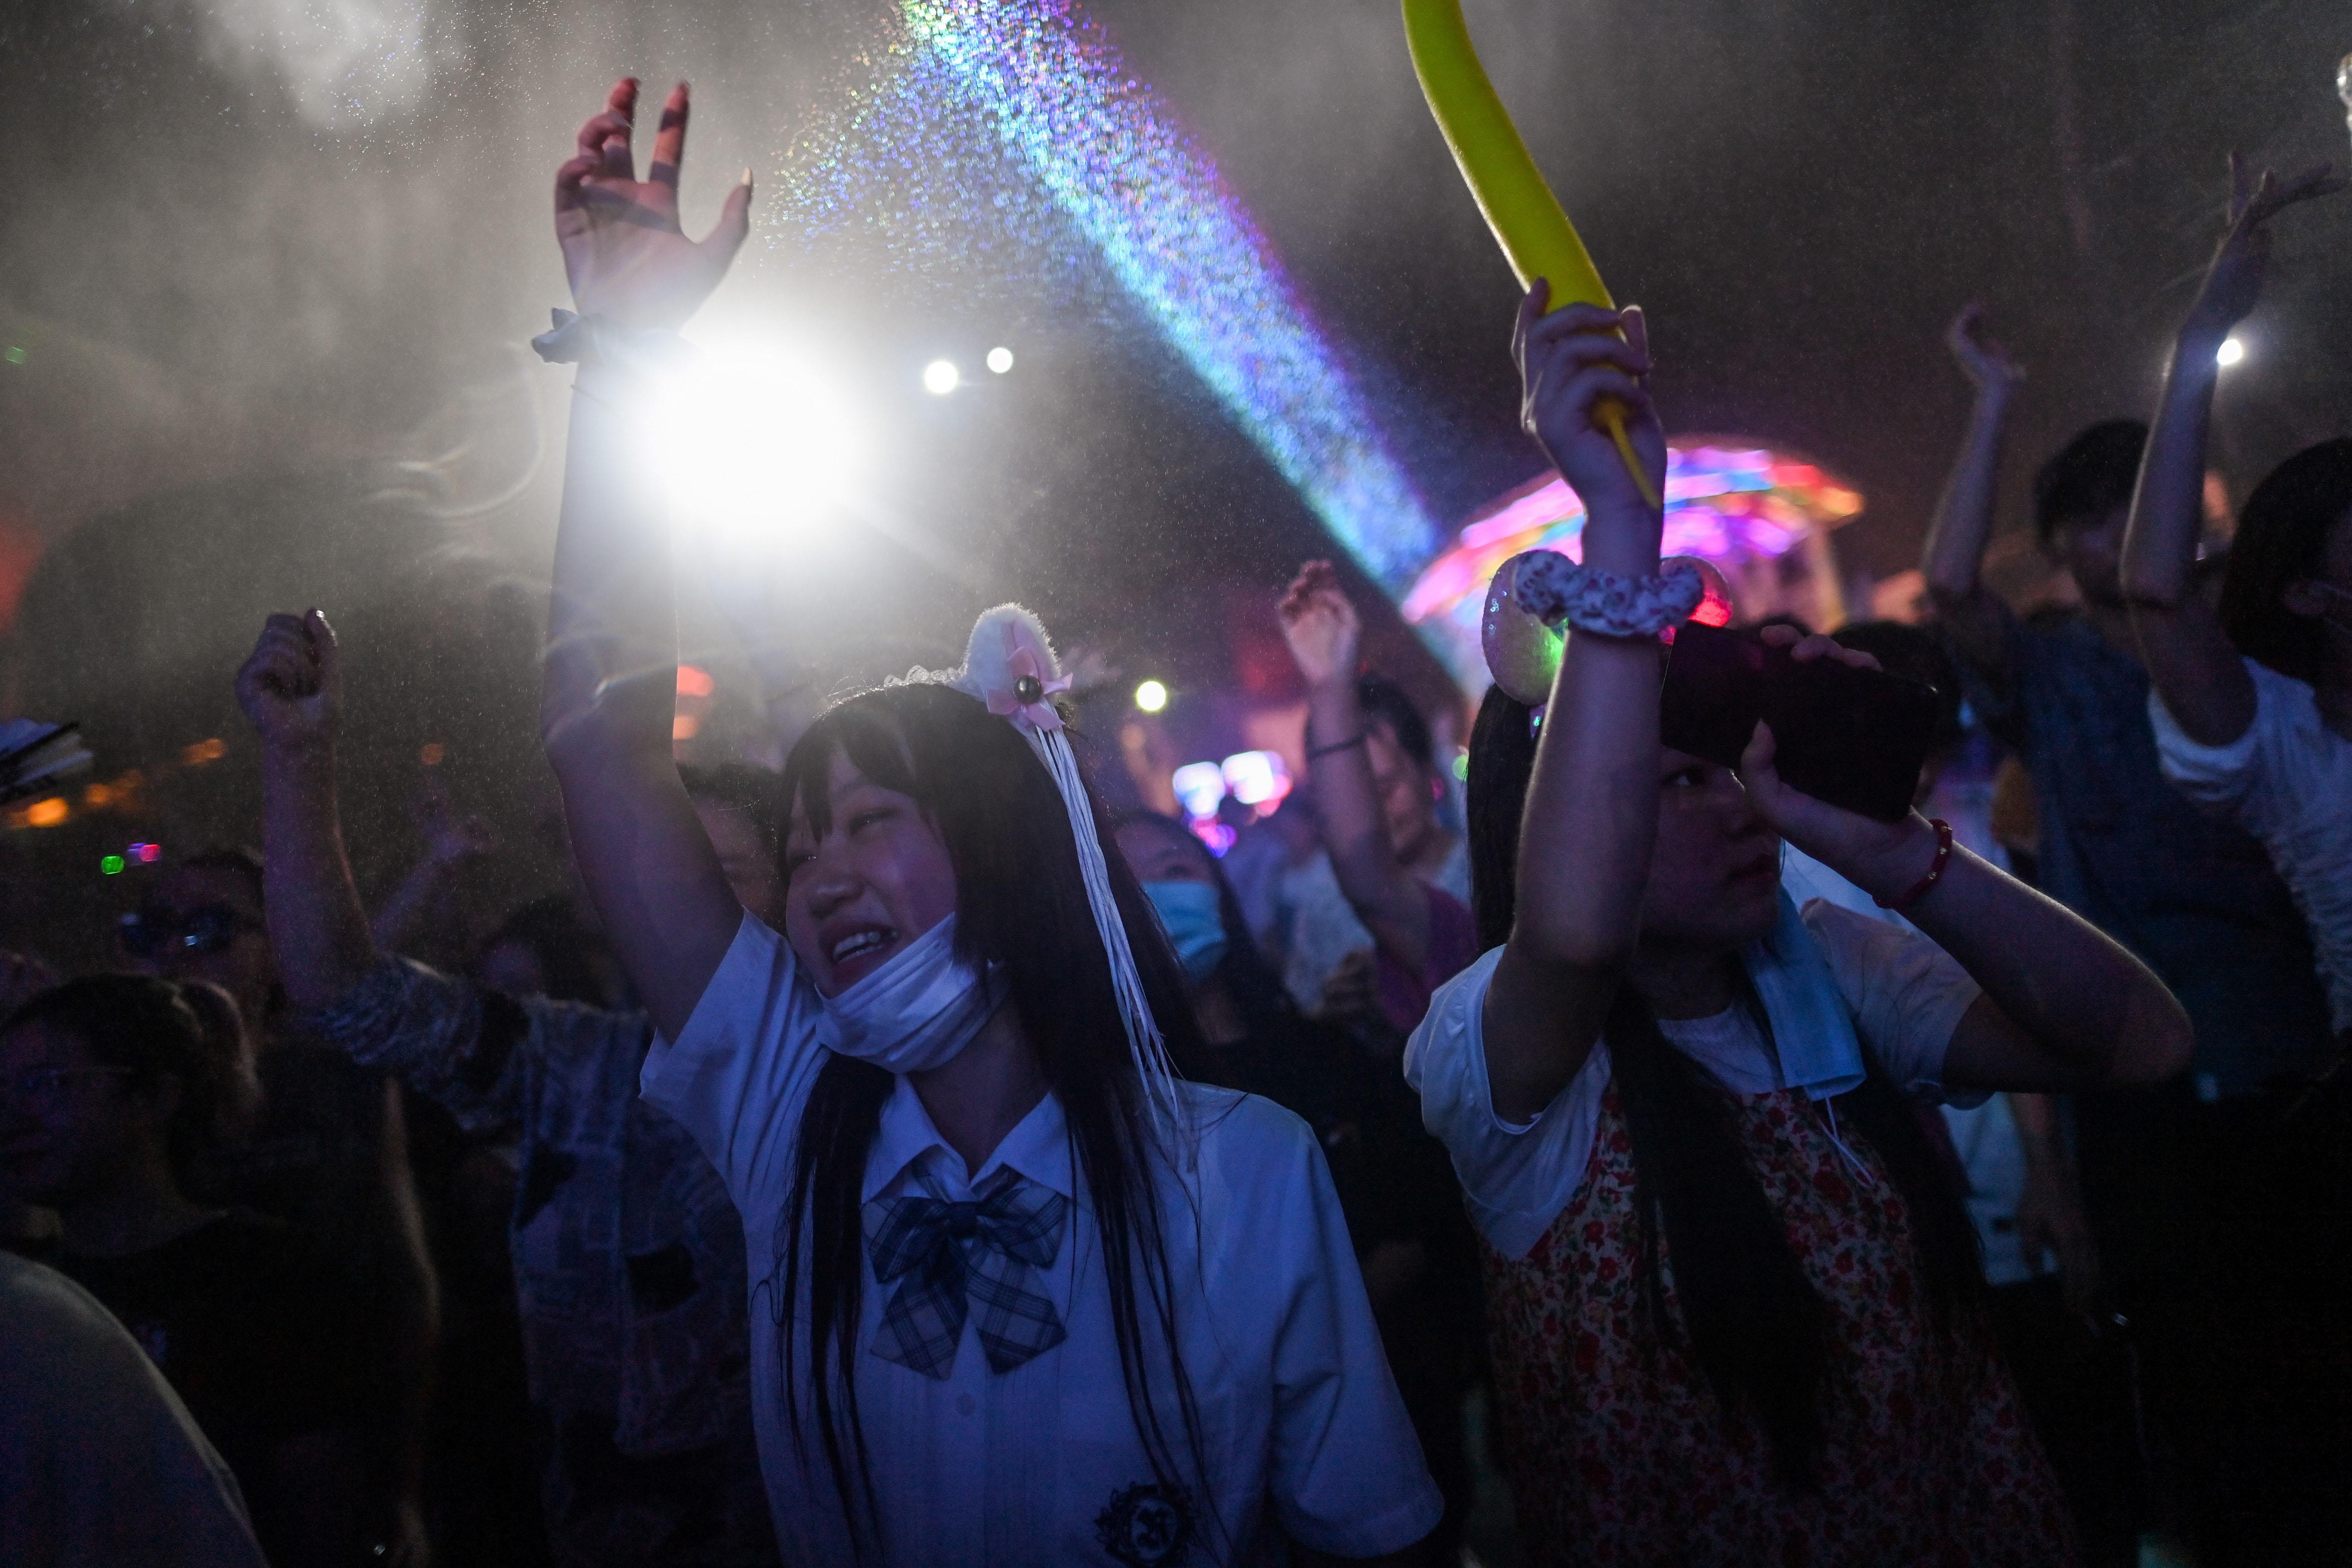 Masivo festival musical, una señal de retorno a la